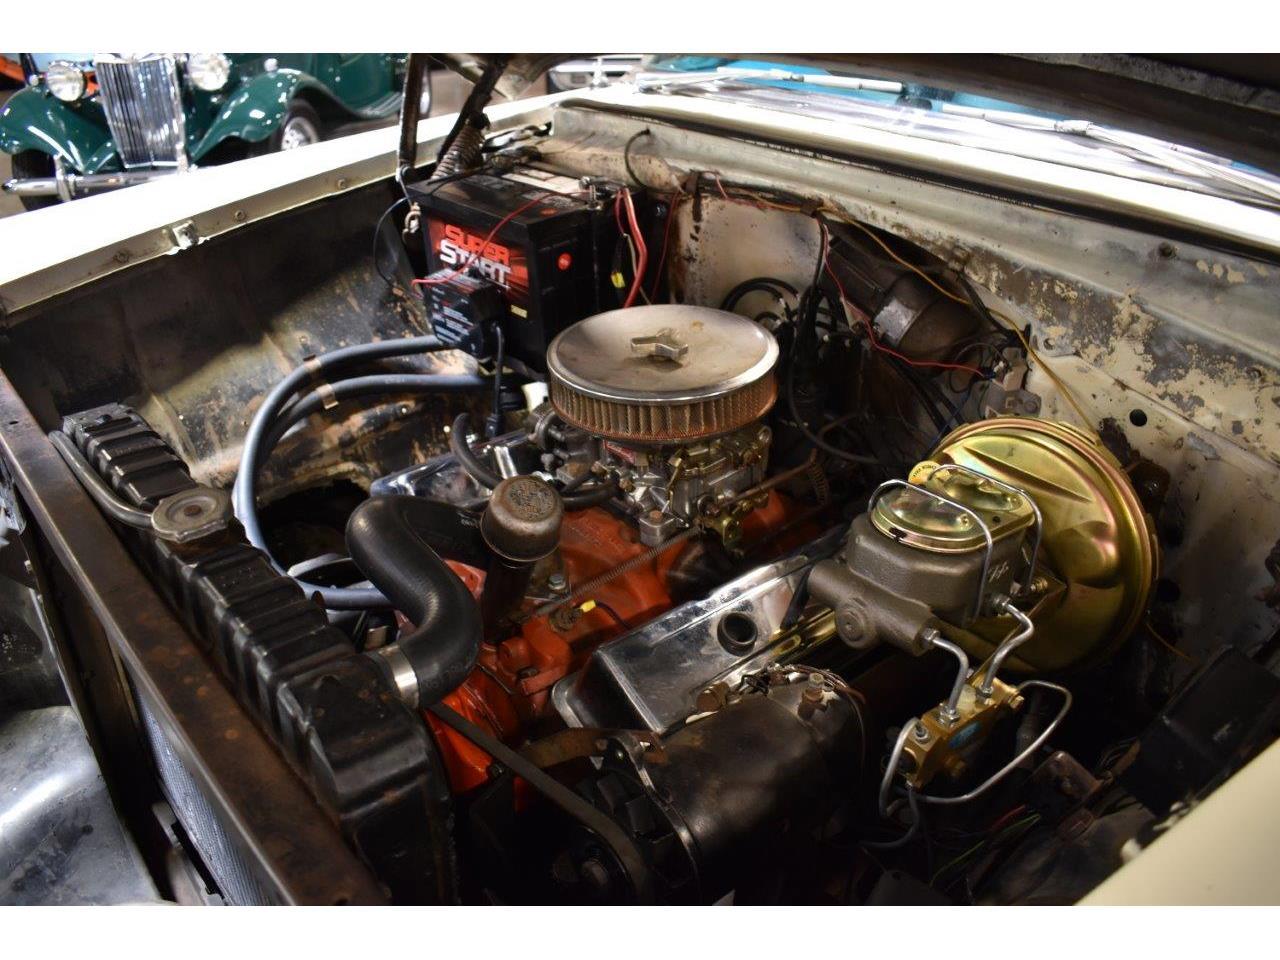 Large Picture of '56 Chevrolet Bel Air located in Costa Mesa California - $19,900.00 - Q5GK